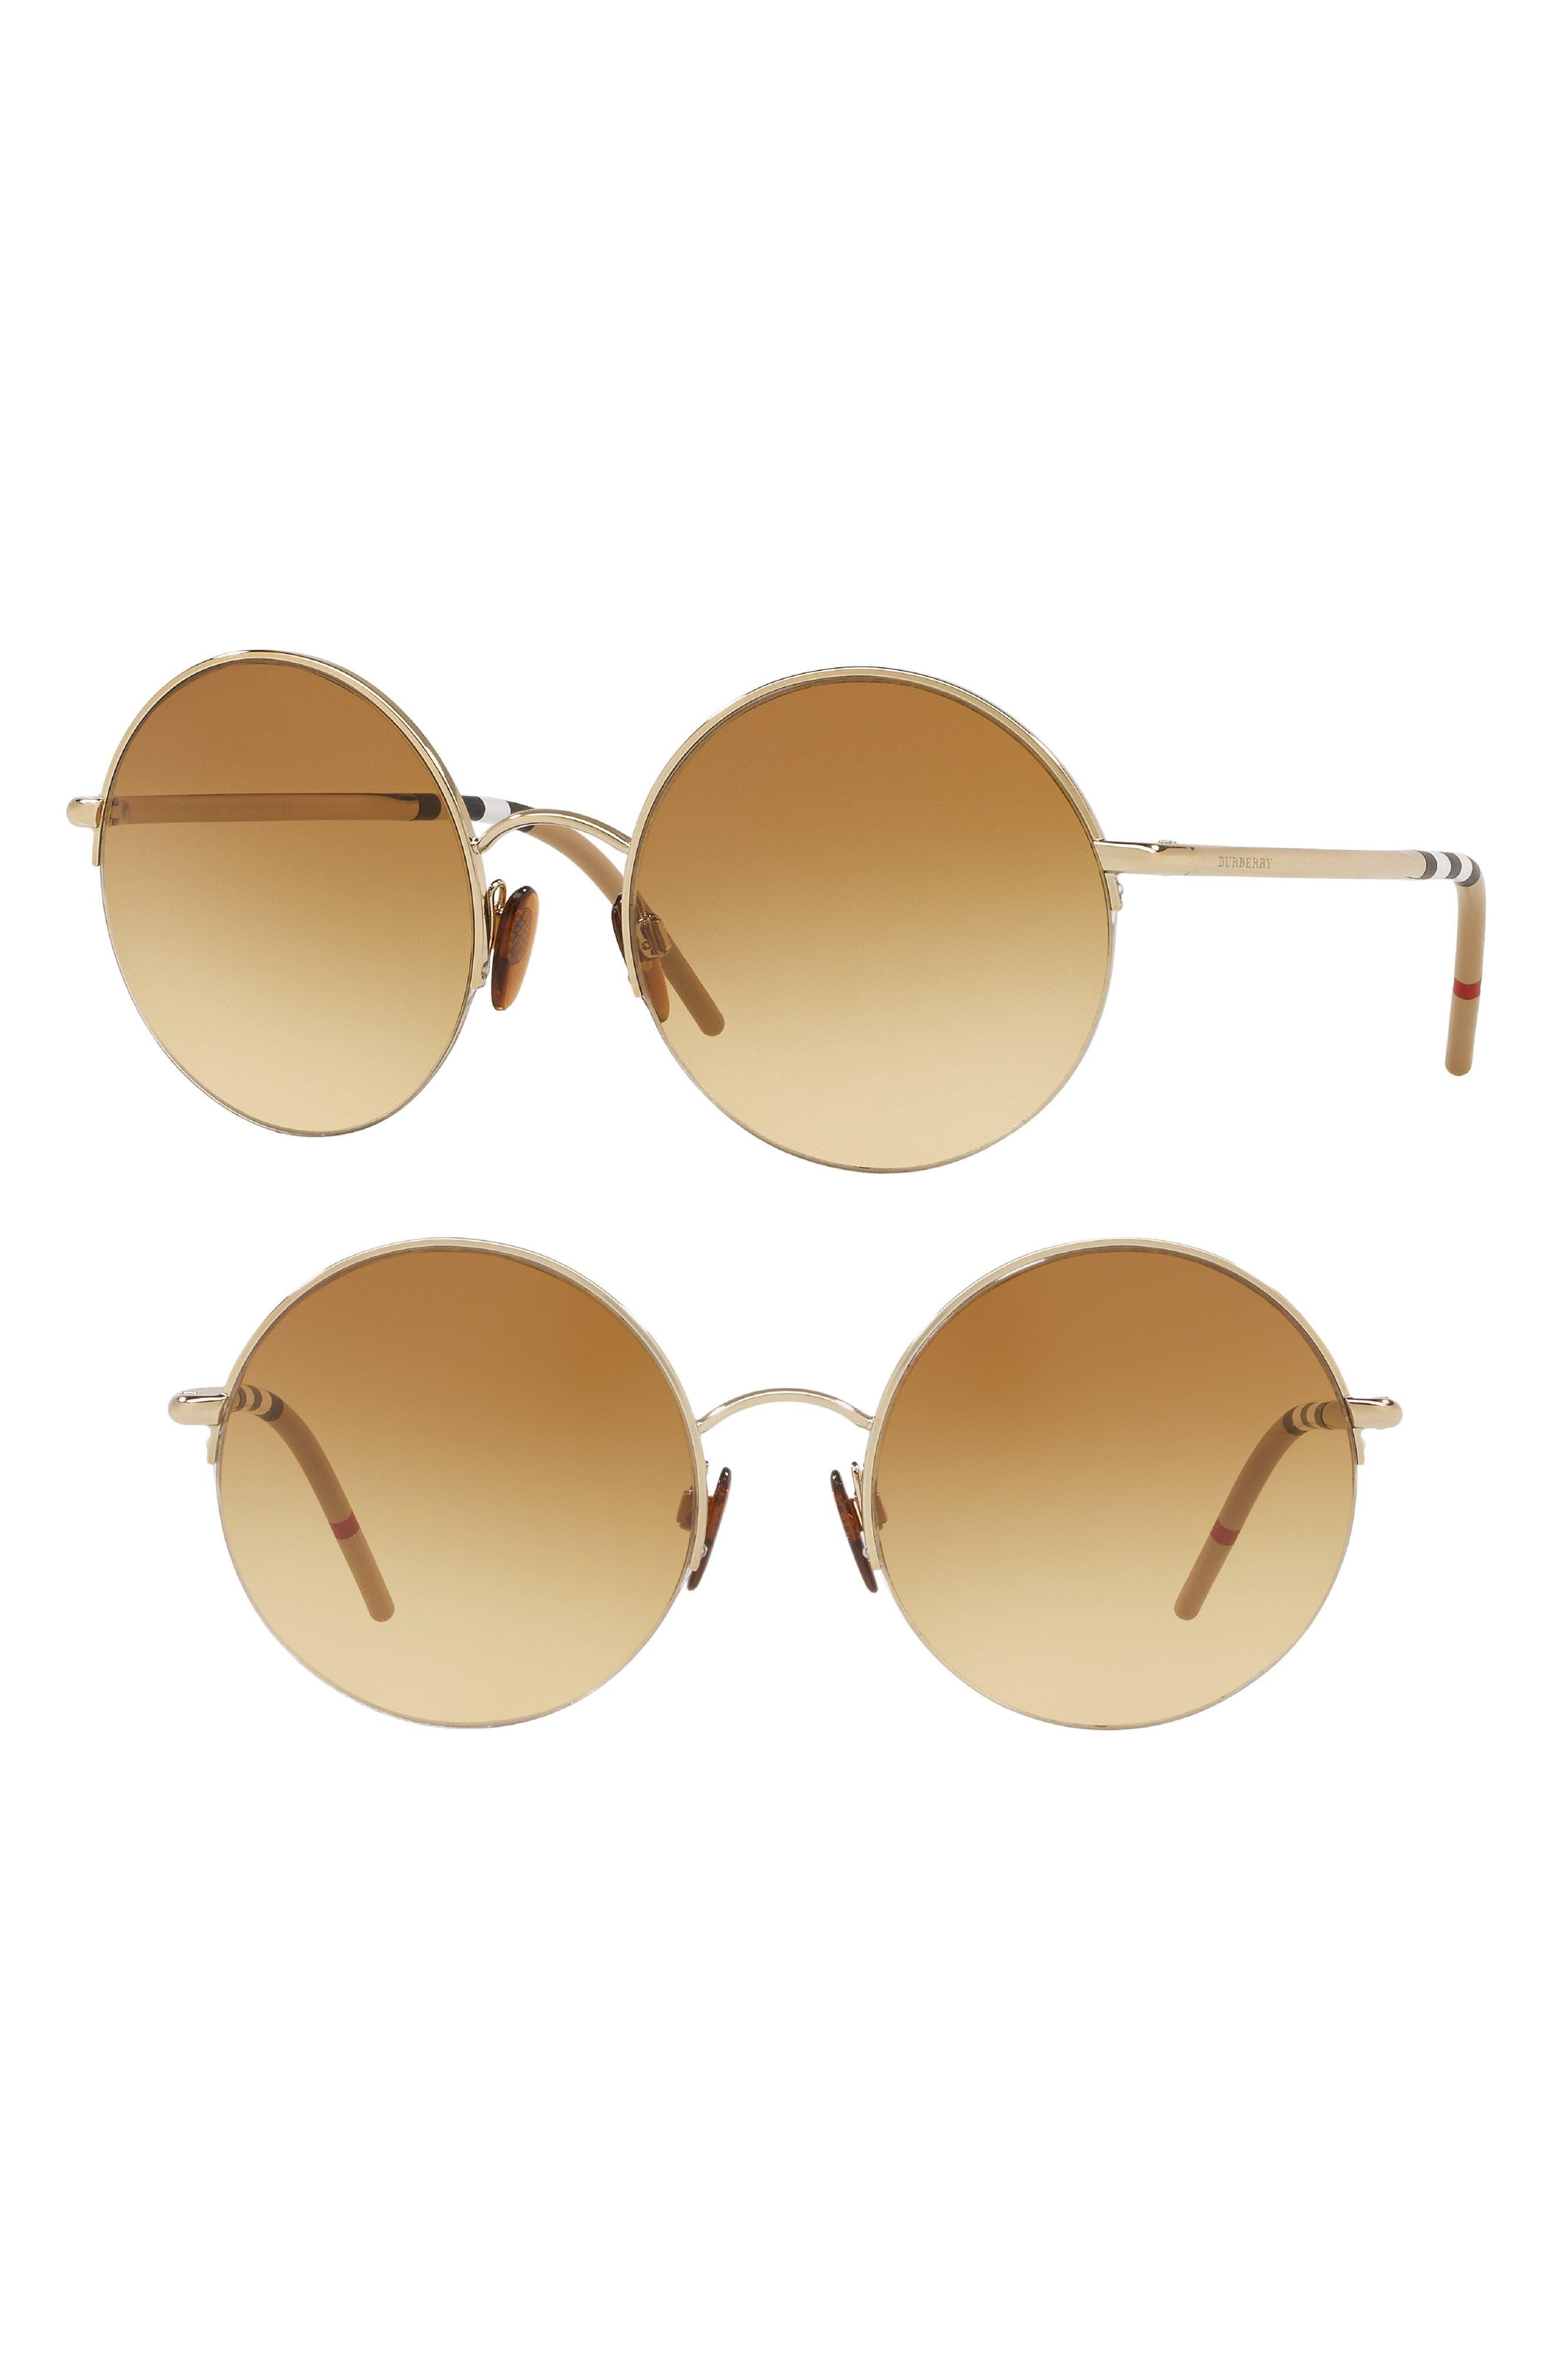 54mm Round Sunglasses,                             Main thumbnail 1, color,                             GOLD GRADIENT